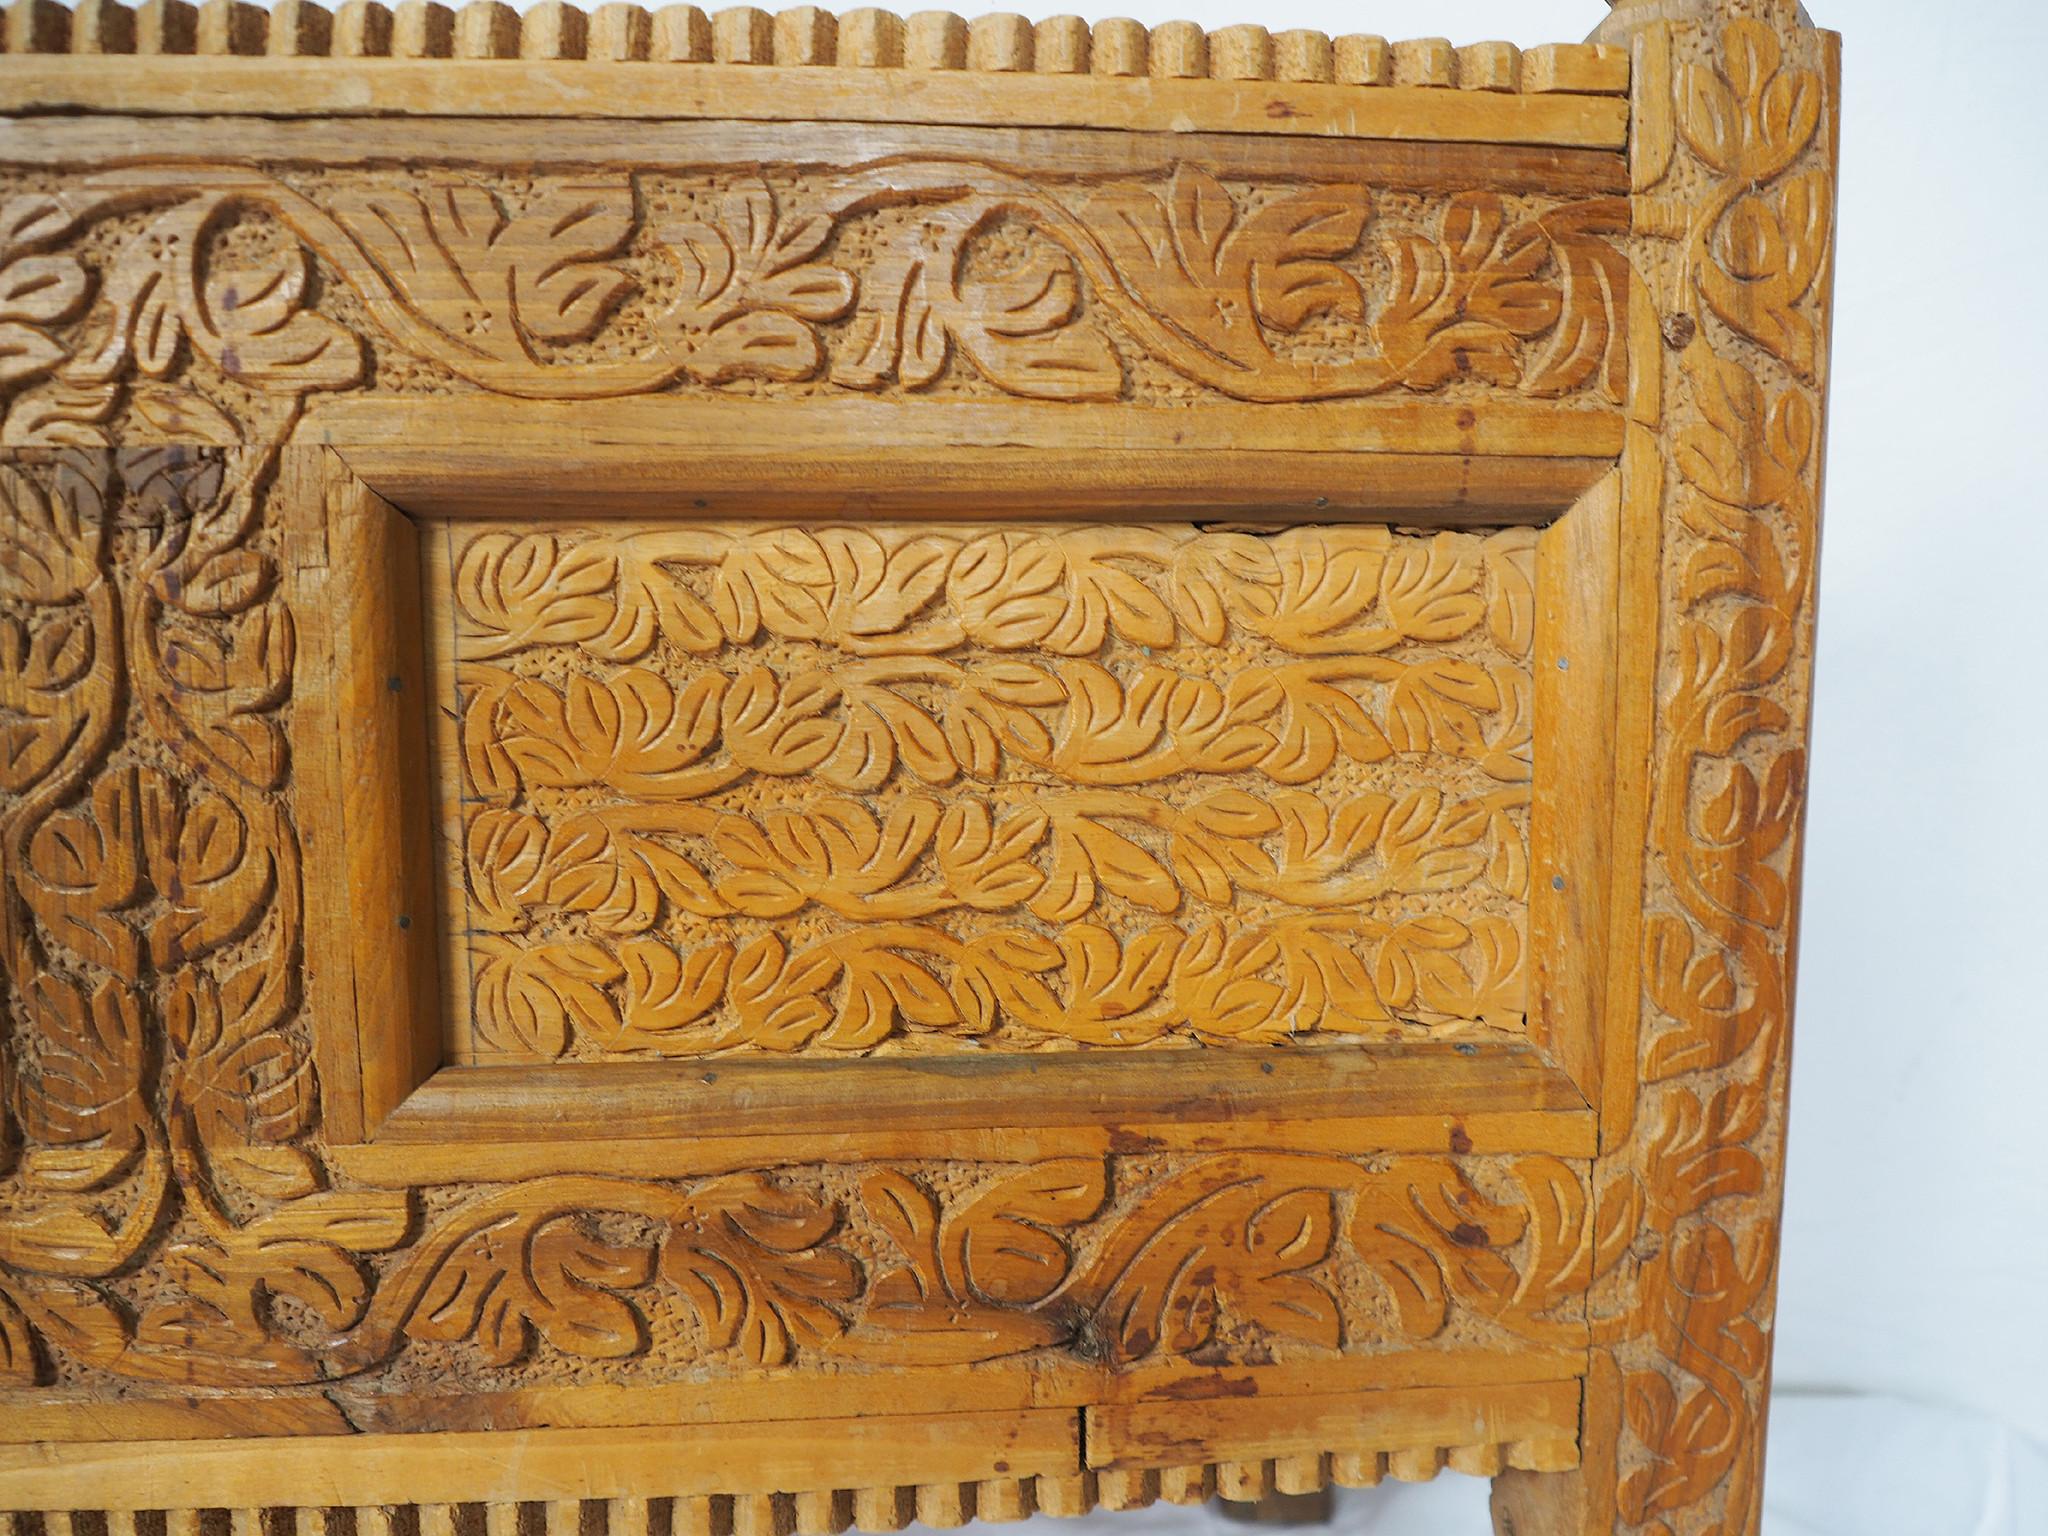 Antike orient Aussteuer Truhe  Afghanistan Kabul istalif No:B